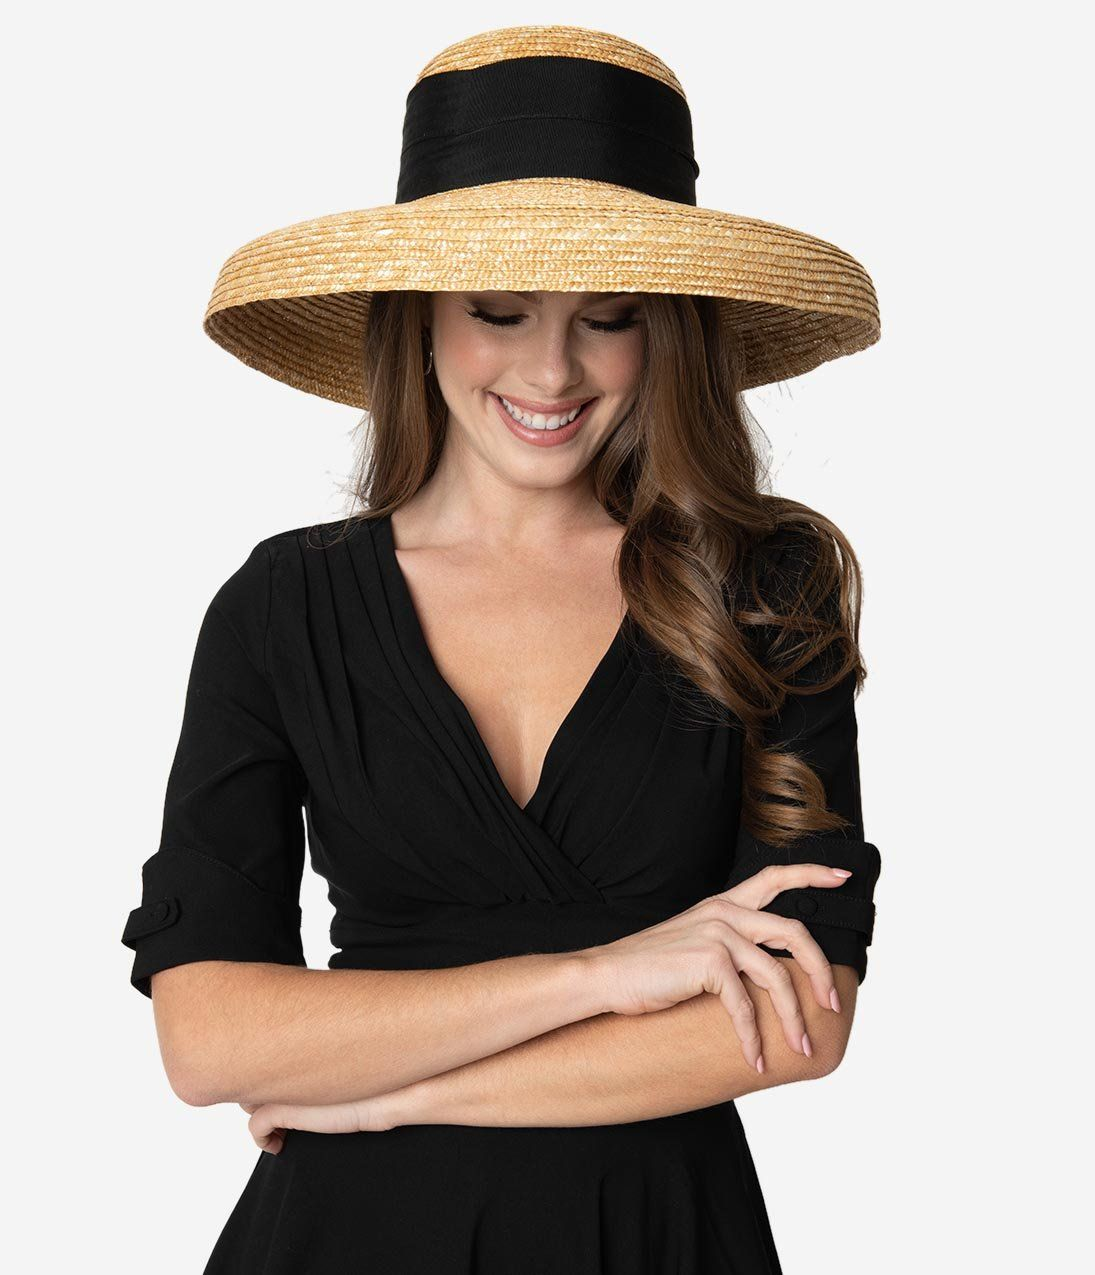 Fashion Hat Pillbox Hat Womens Straw Hat Summer Hat for Women Wedding Hat 1950s Style Hat Beret Hat Panama Hat Straw Fascinator Hat